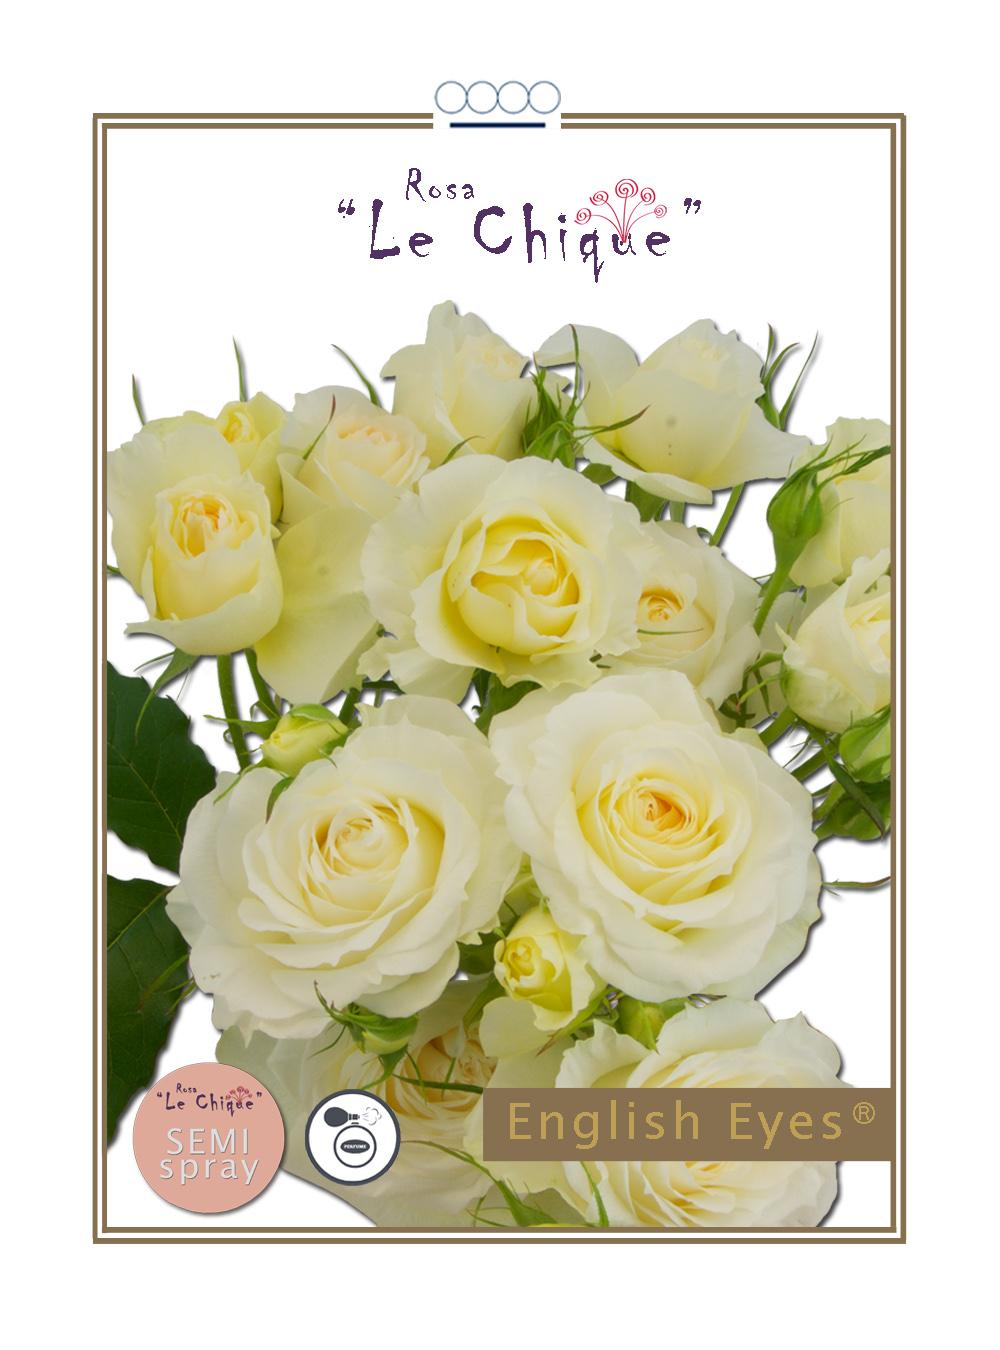 English Eyes®